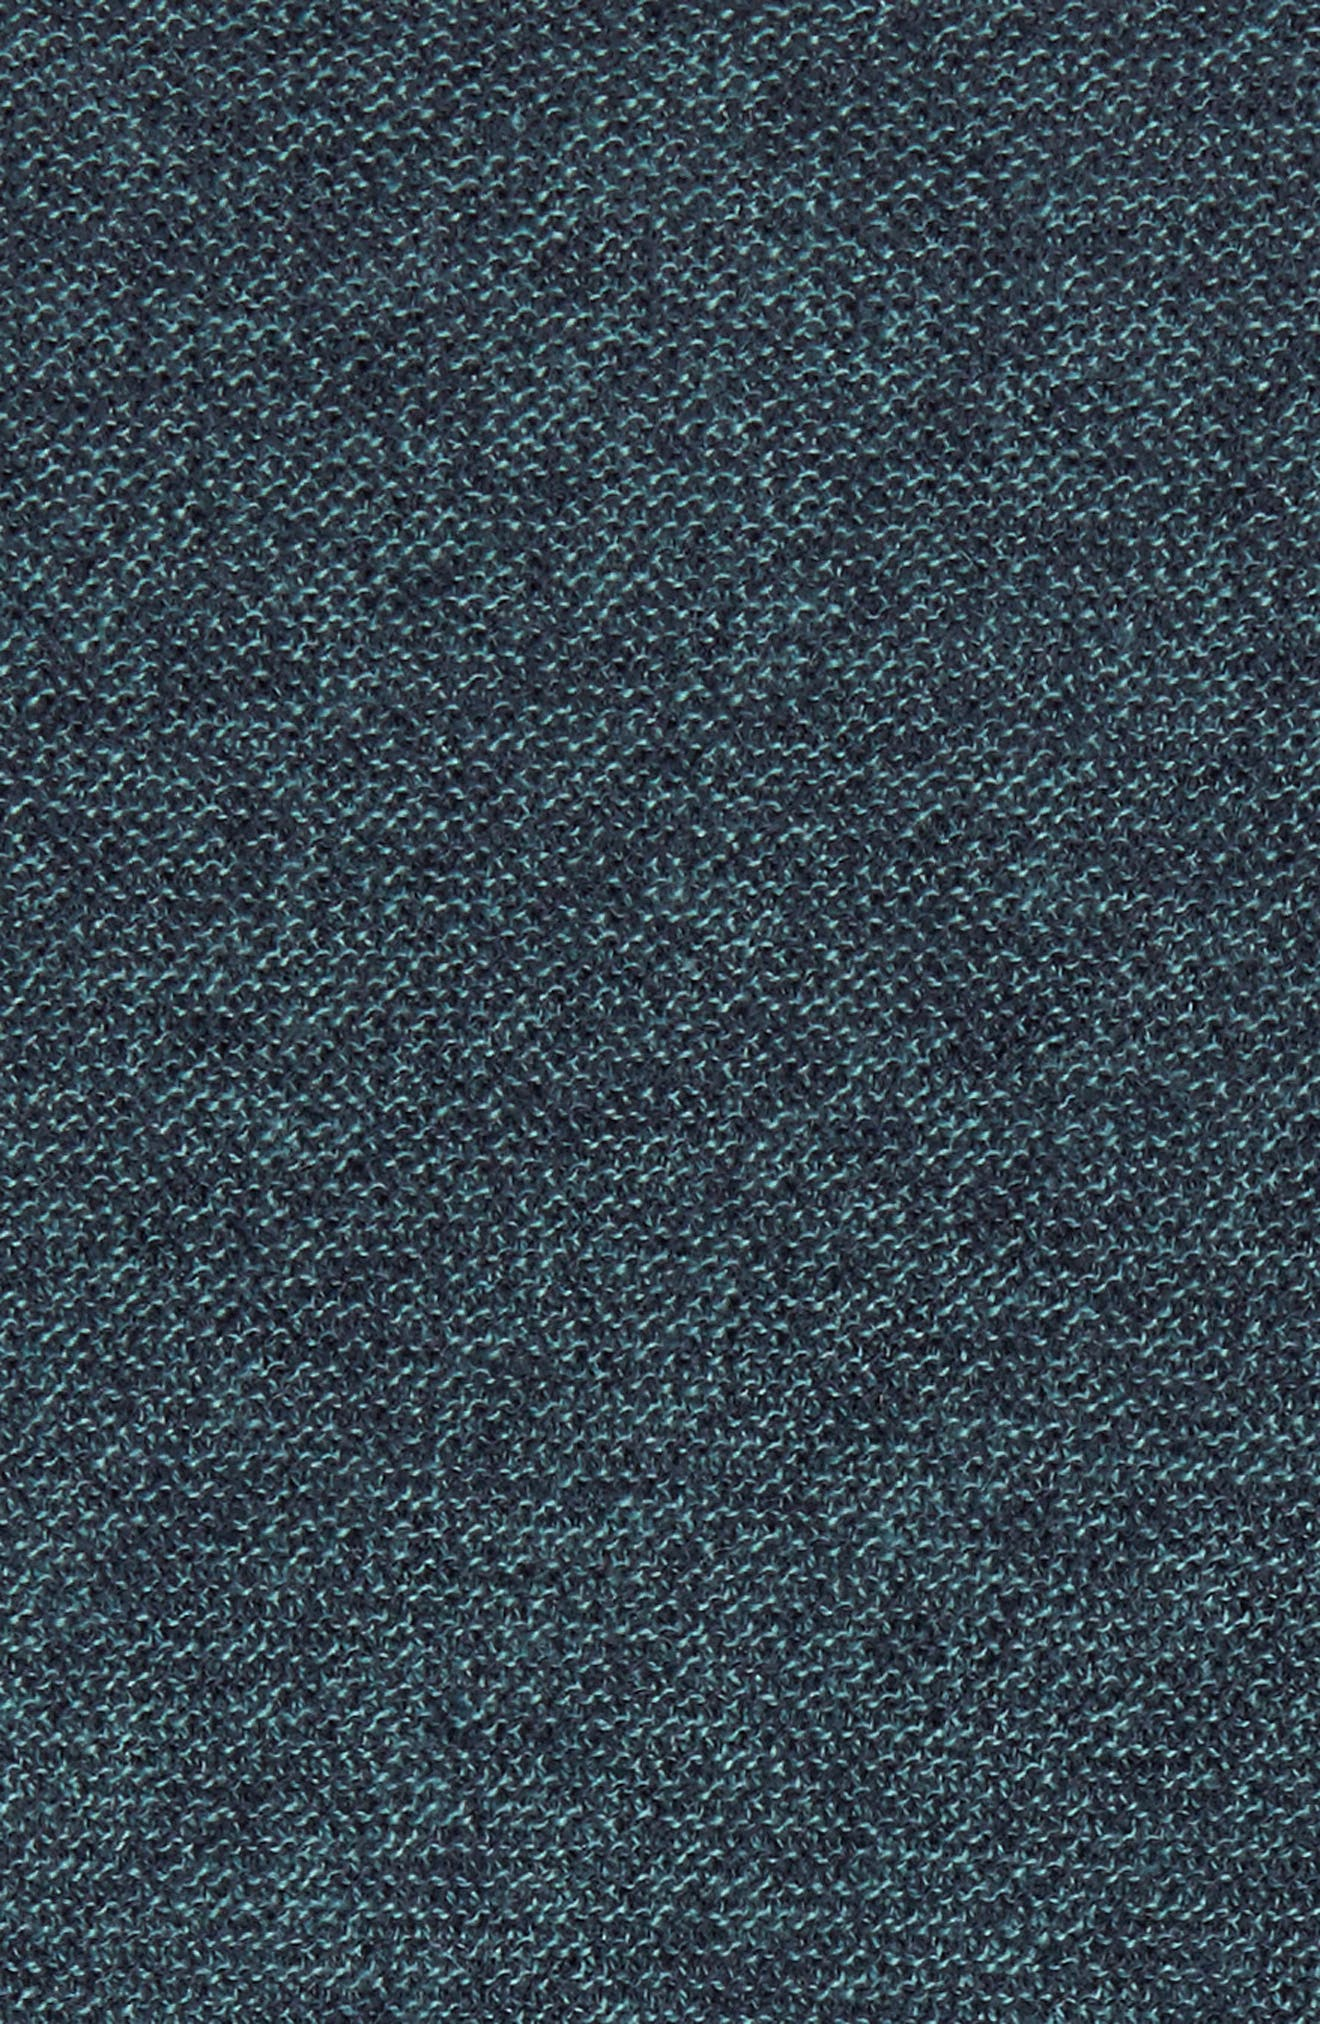 Ridgewood V-Neck Sweater,                             Alternate thumbnail 5, color,                             Turf/ Naval Blue Melange